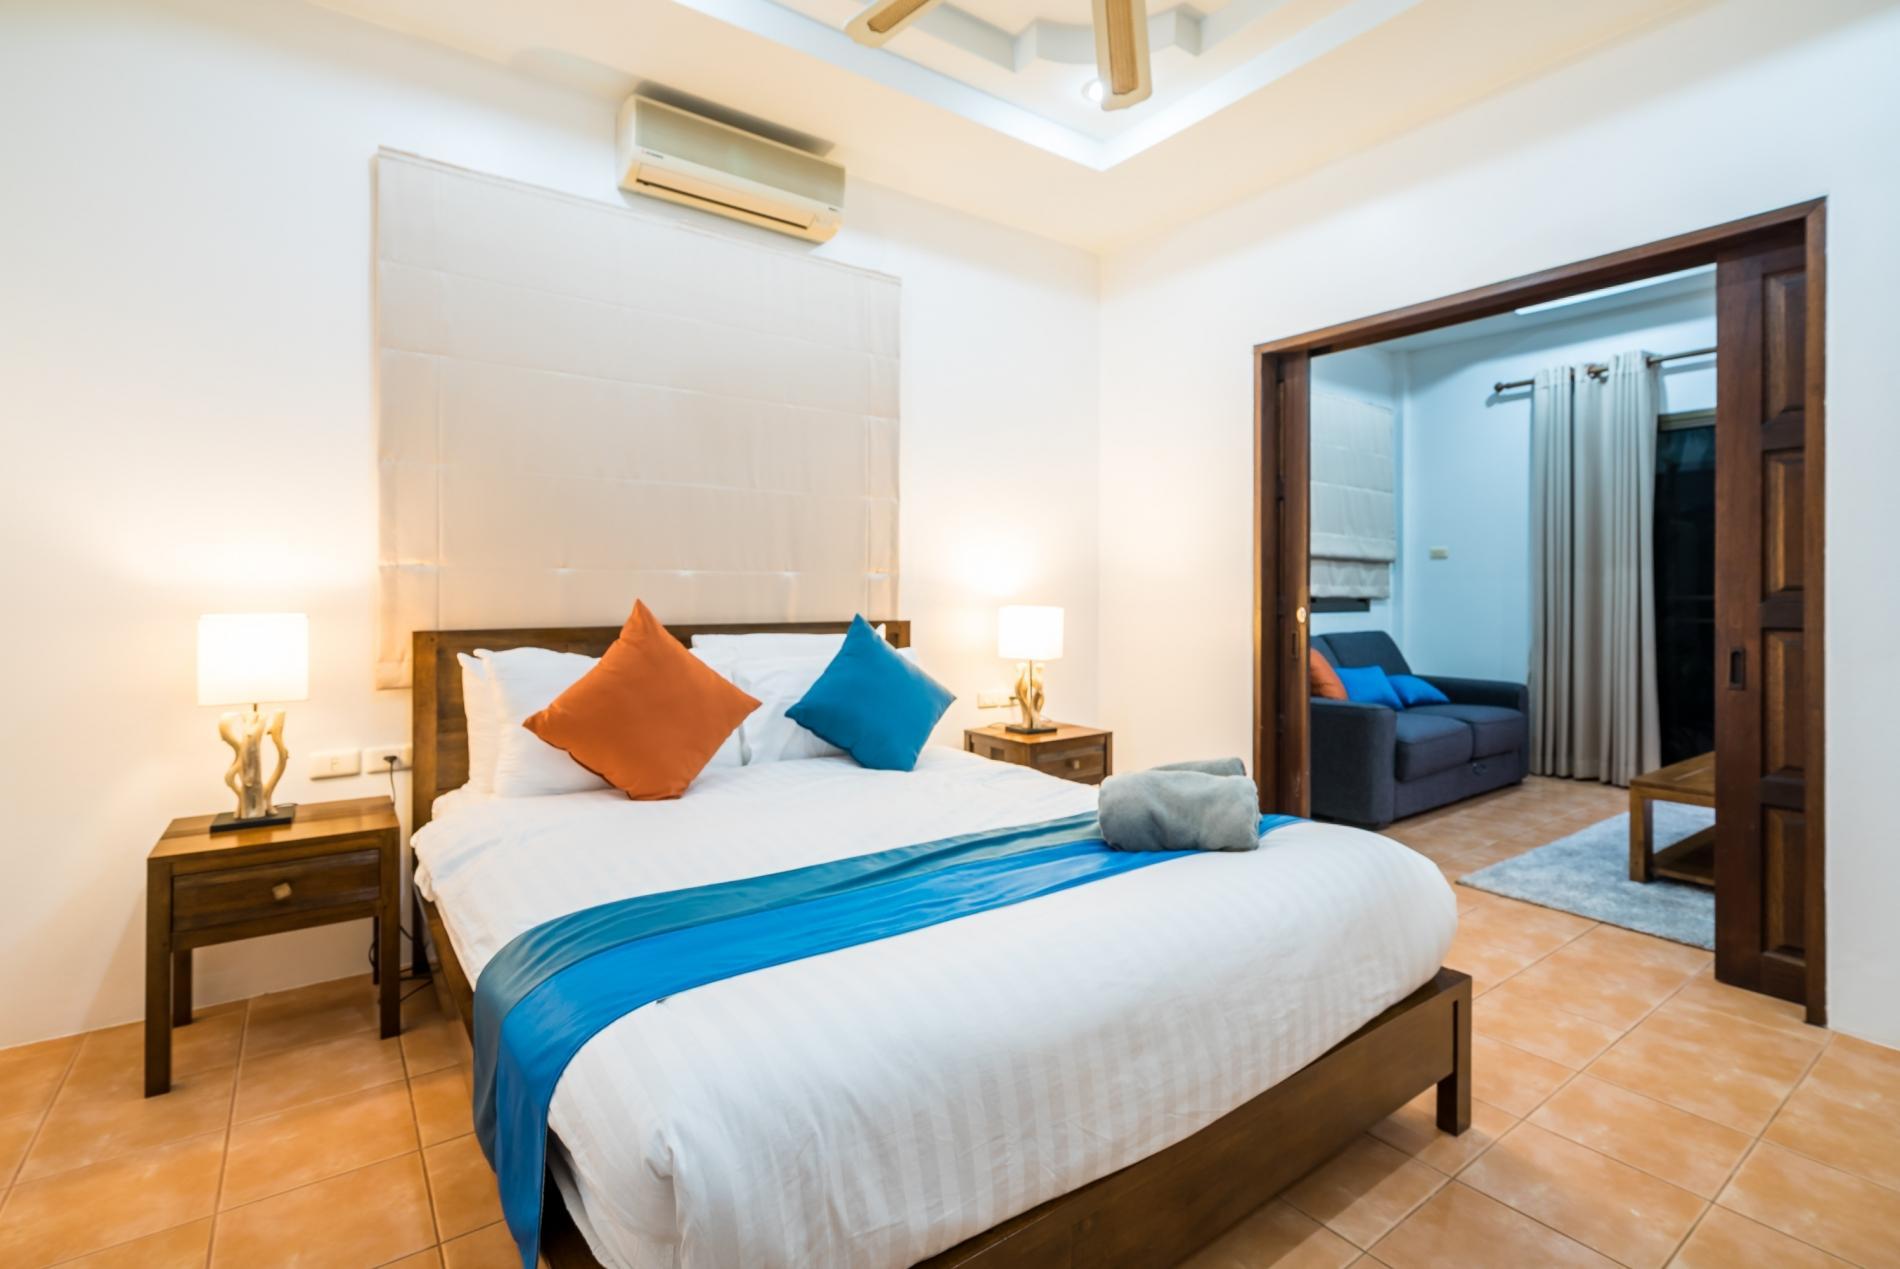 Apartment Pasak soi 3 - Convenient pool villa in quiet location  near Laguna  Boat avenue photo 19121868